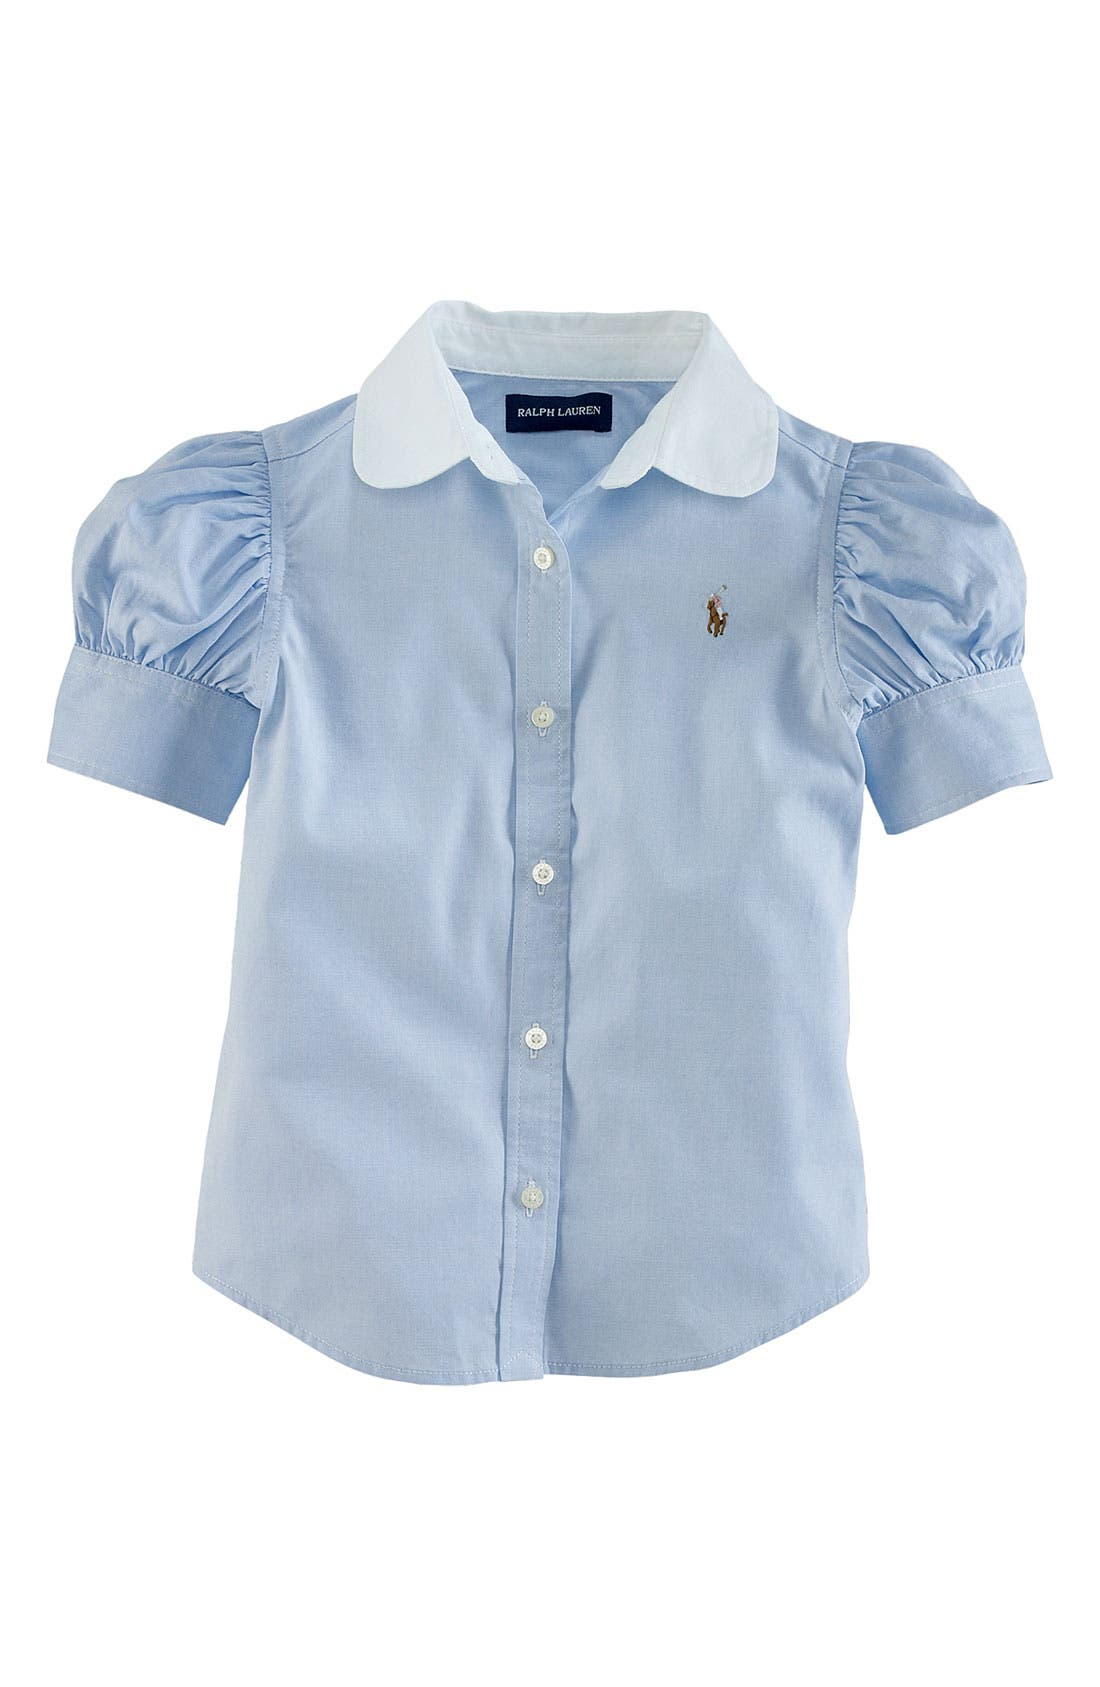 Alternate Image 1 Selected - Ralph Lauren Pinpoint Oxford Shirt (Toddler)